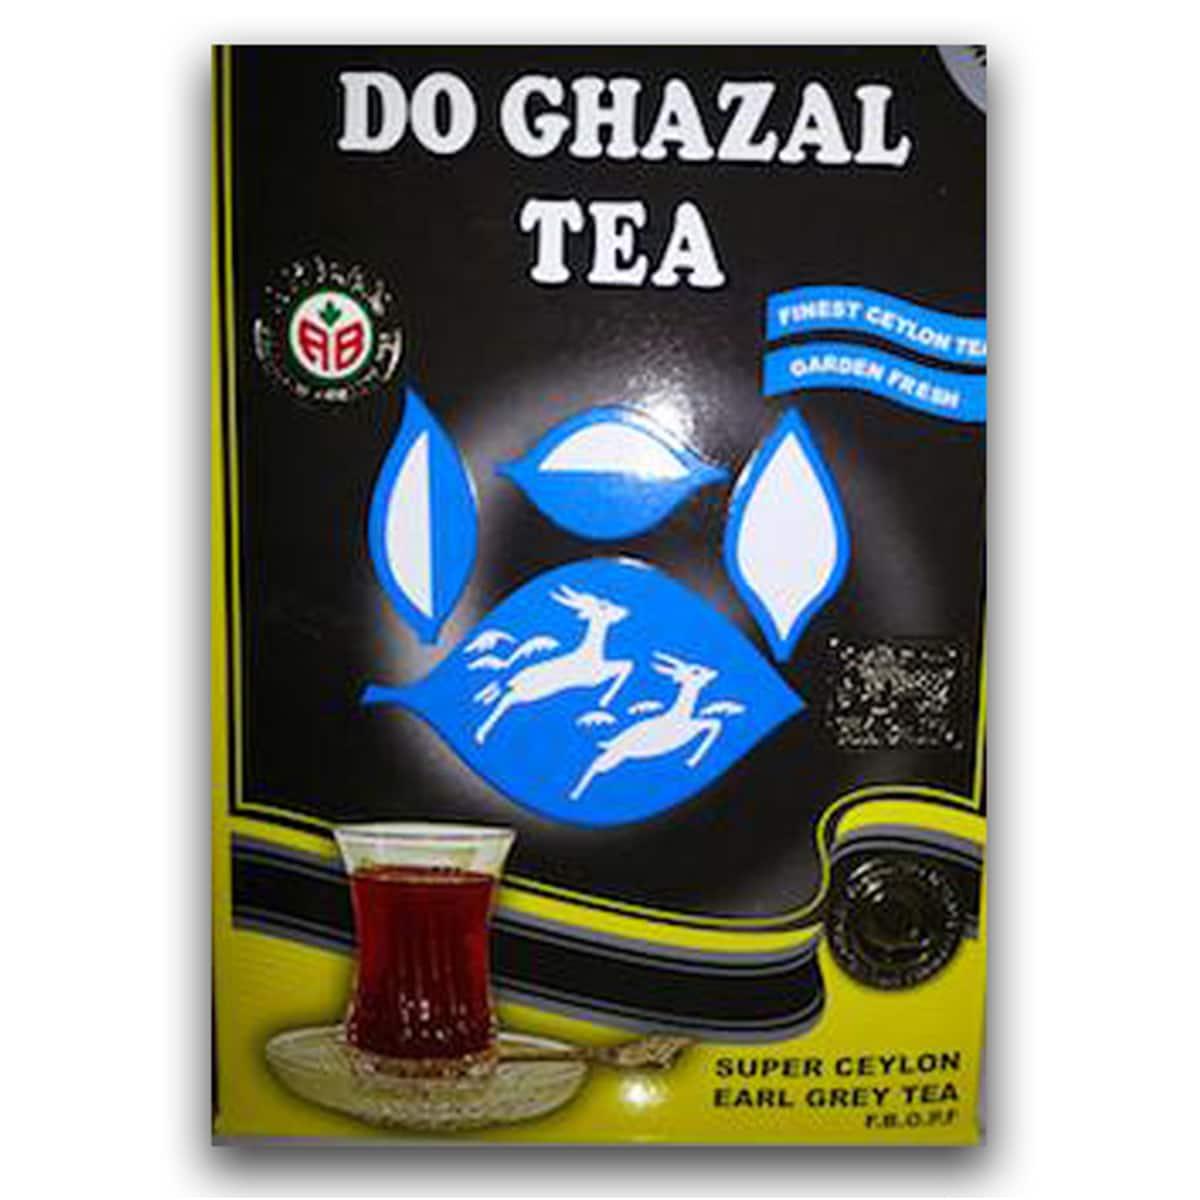 Buy Alghazaleen Tea (Do Ghazal Tea) Super Ceylon Earl Grey Tea (Loose Tea) - 500 gm